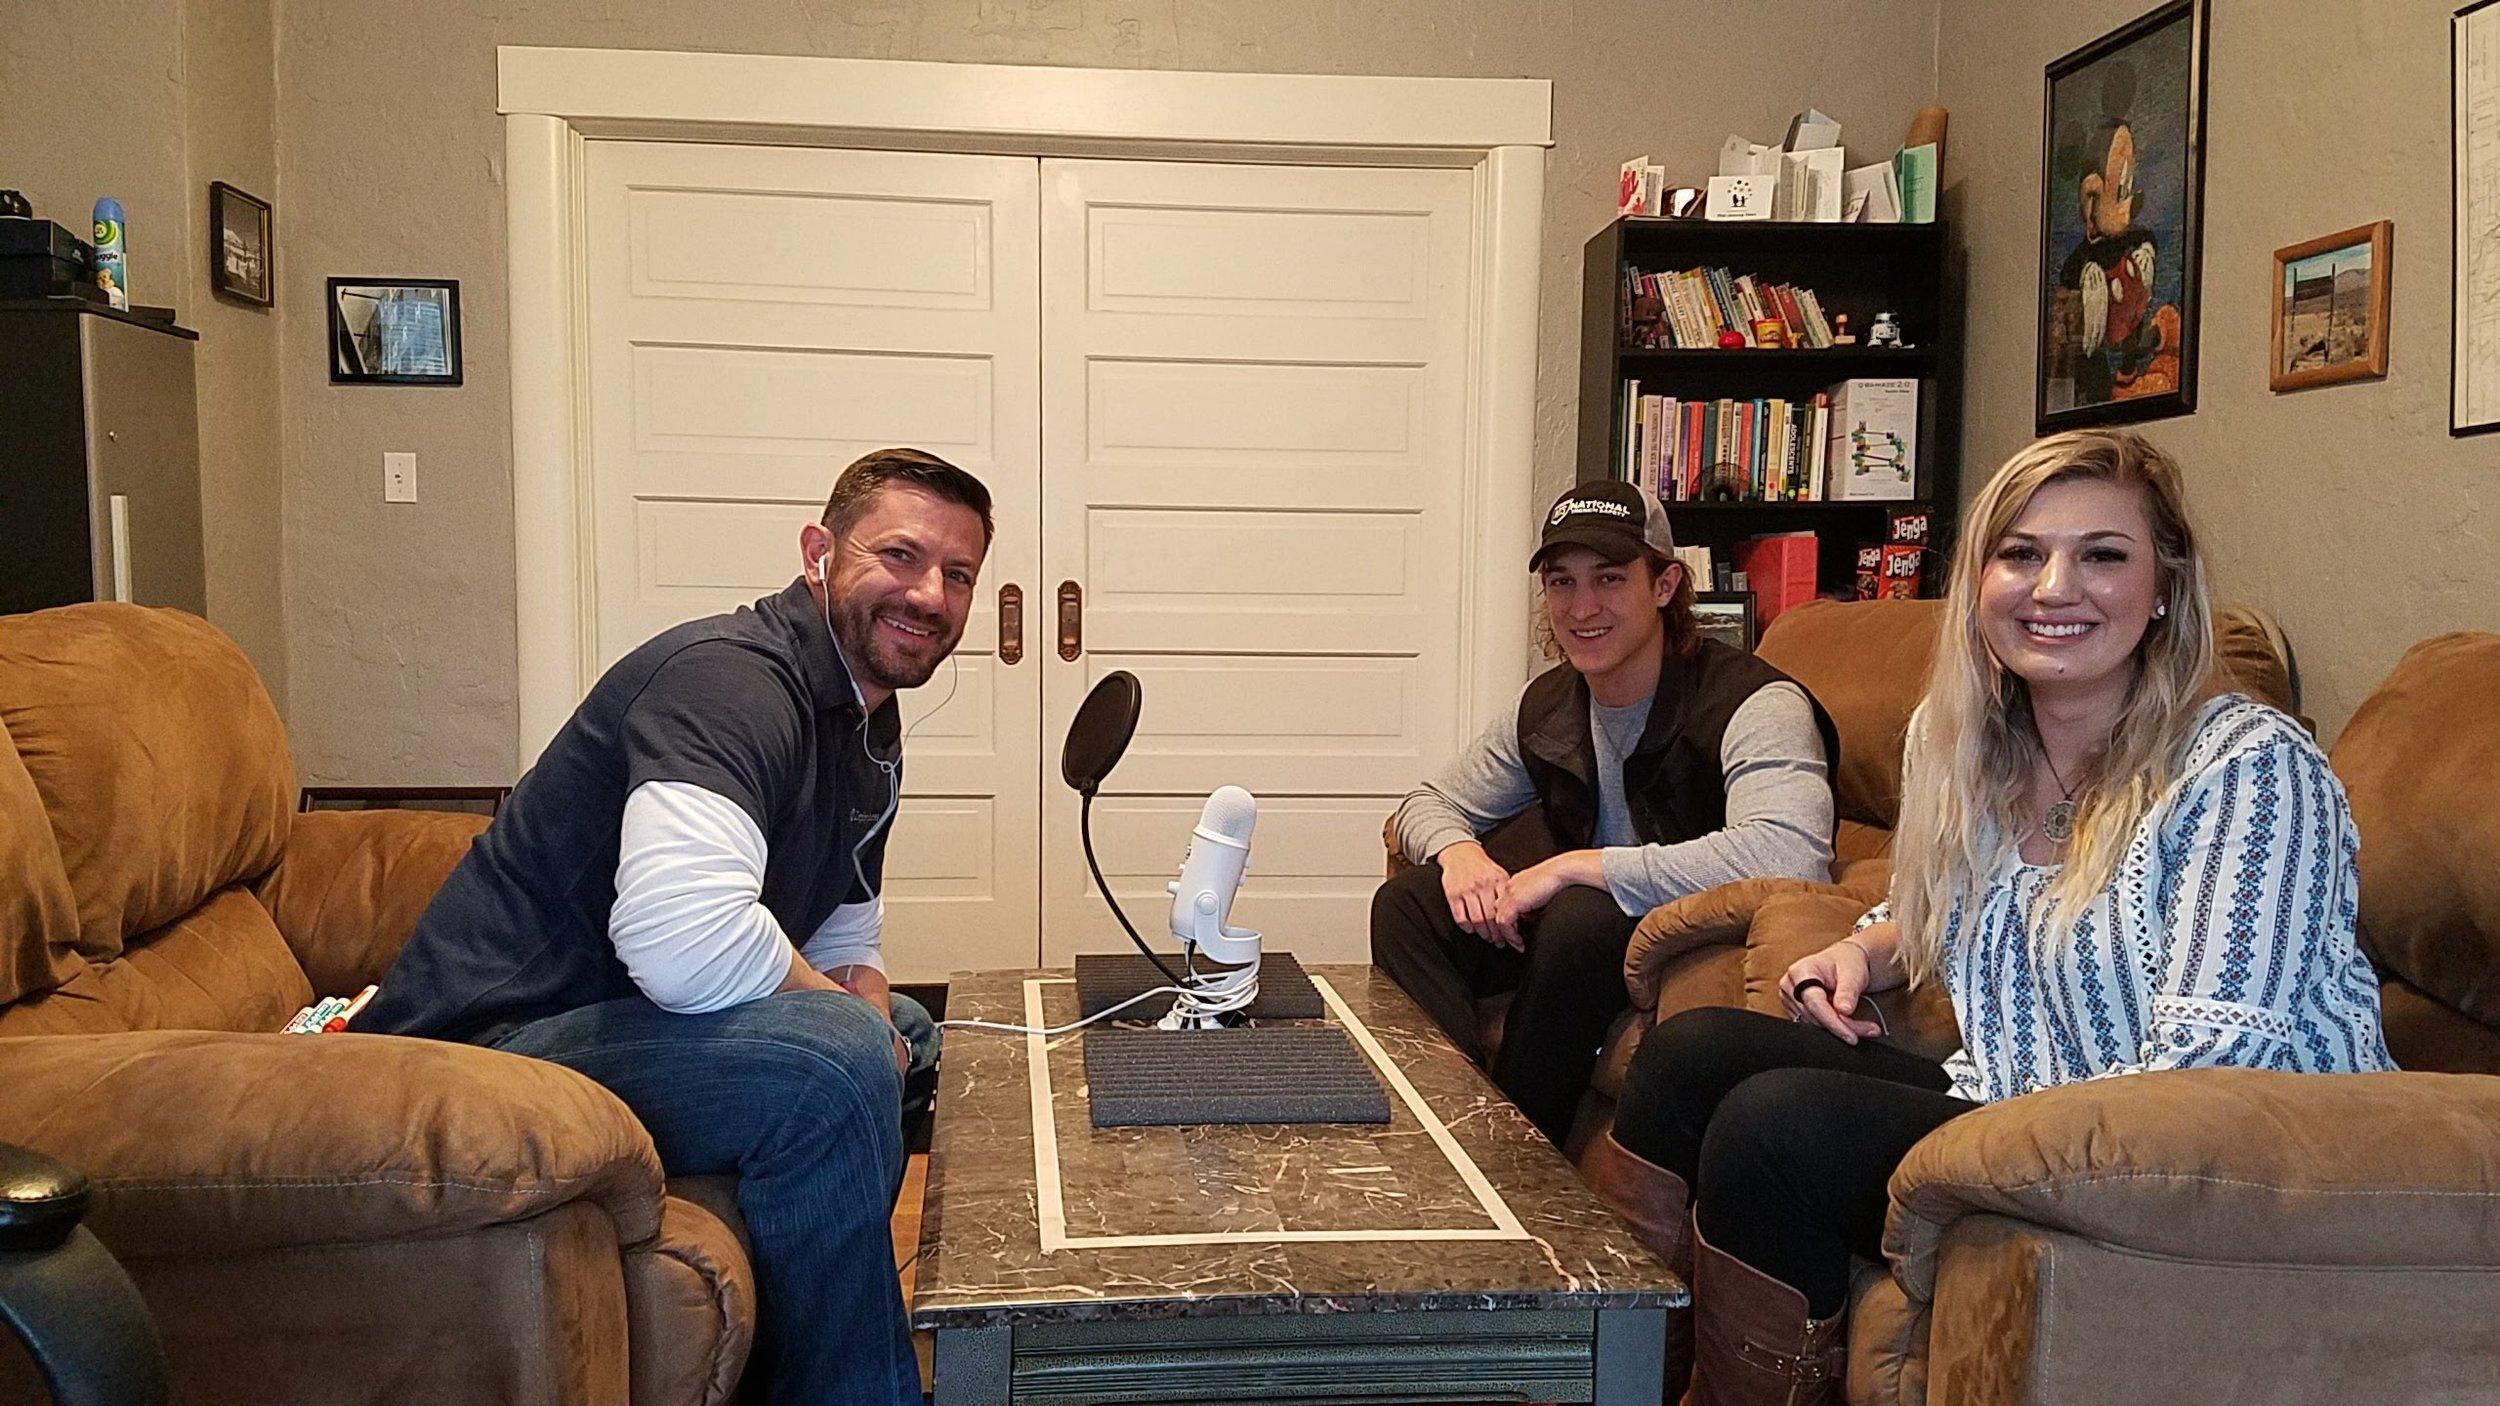 Zephyr Wellness' Jake Wiskerchen records with college students Matt Dutcher, 21, and Lauren Penksa, 23, both from the University of Nevada.